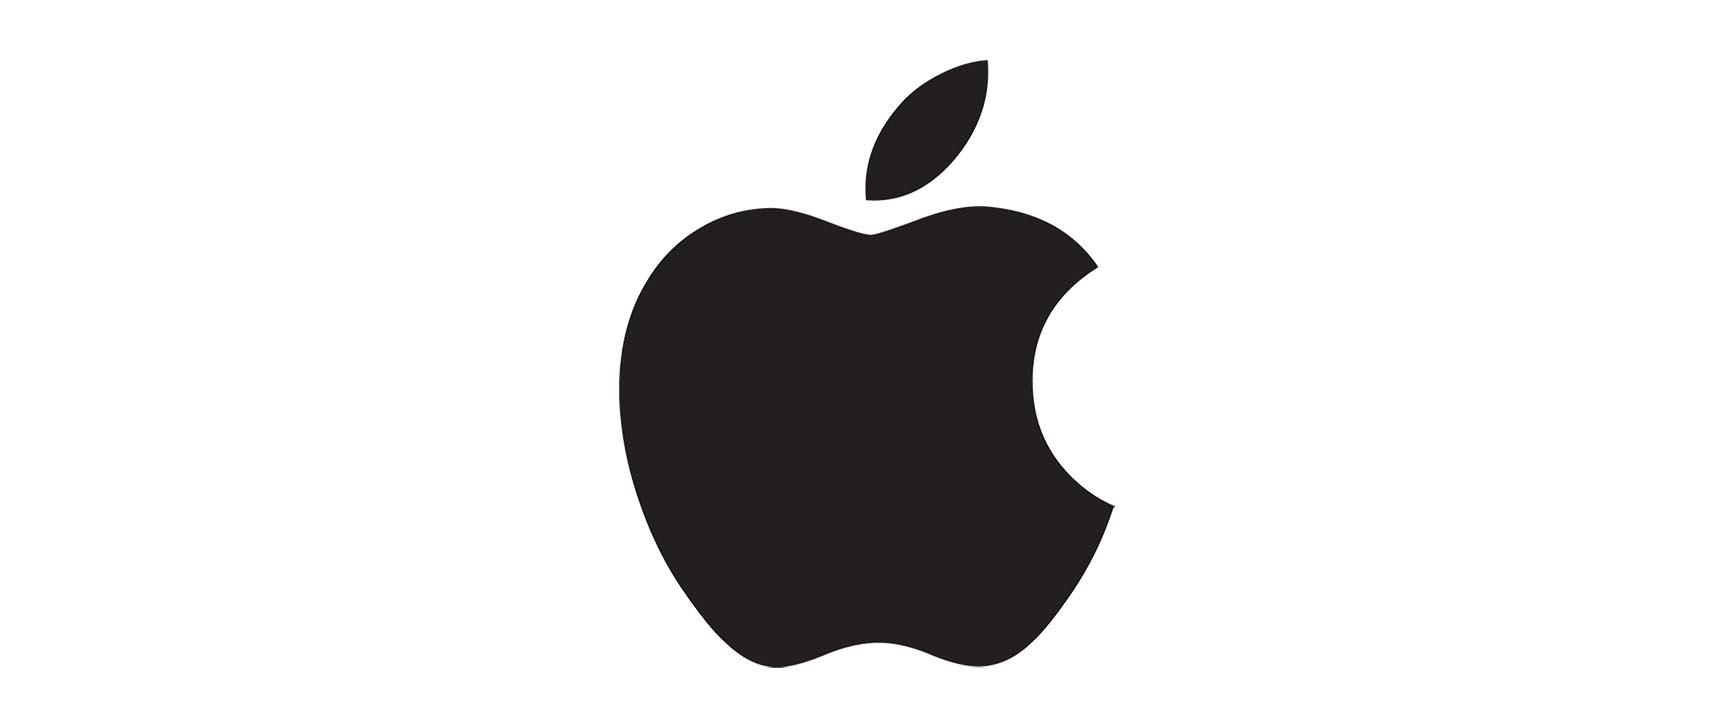 16 Apple.jpg